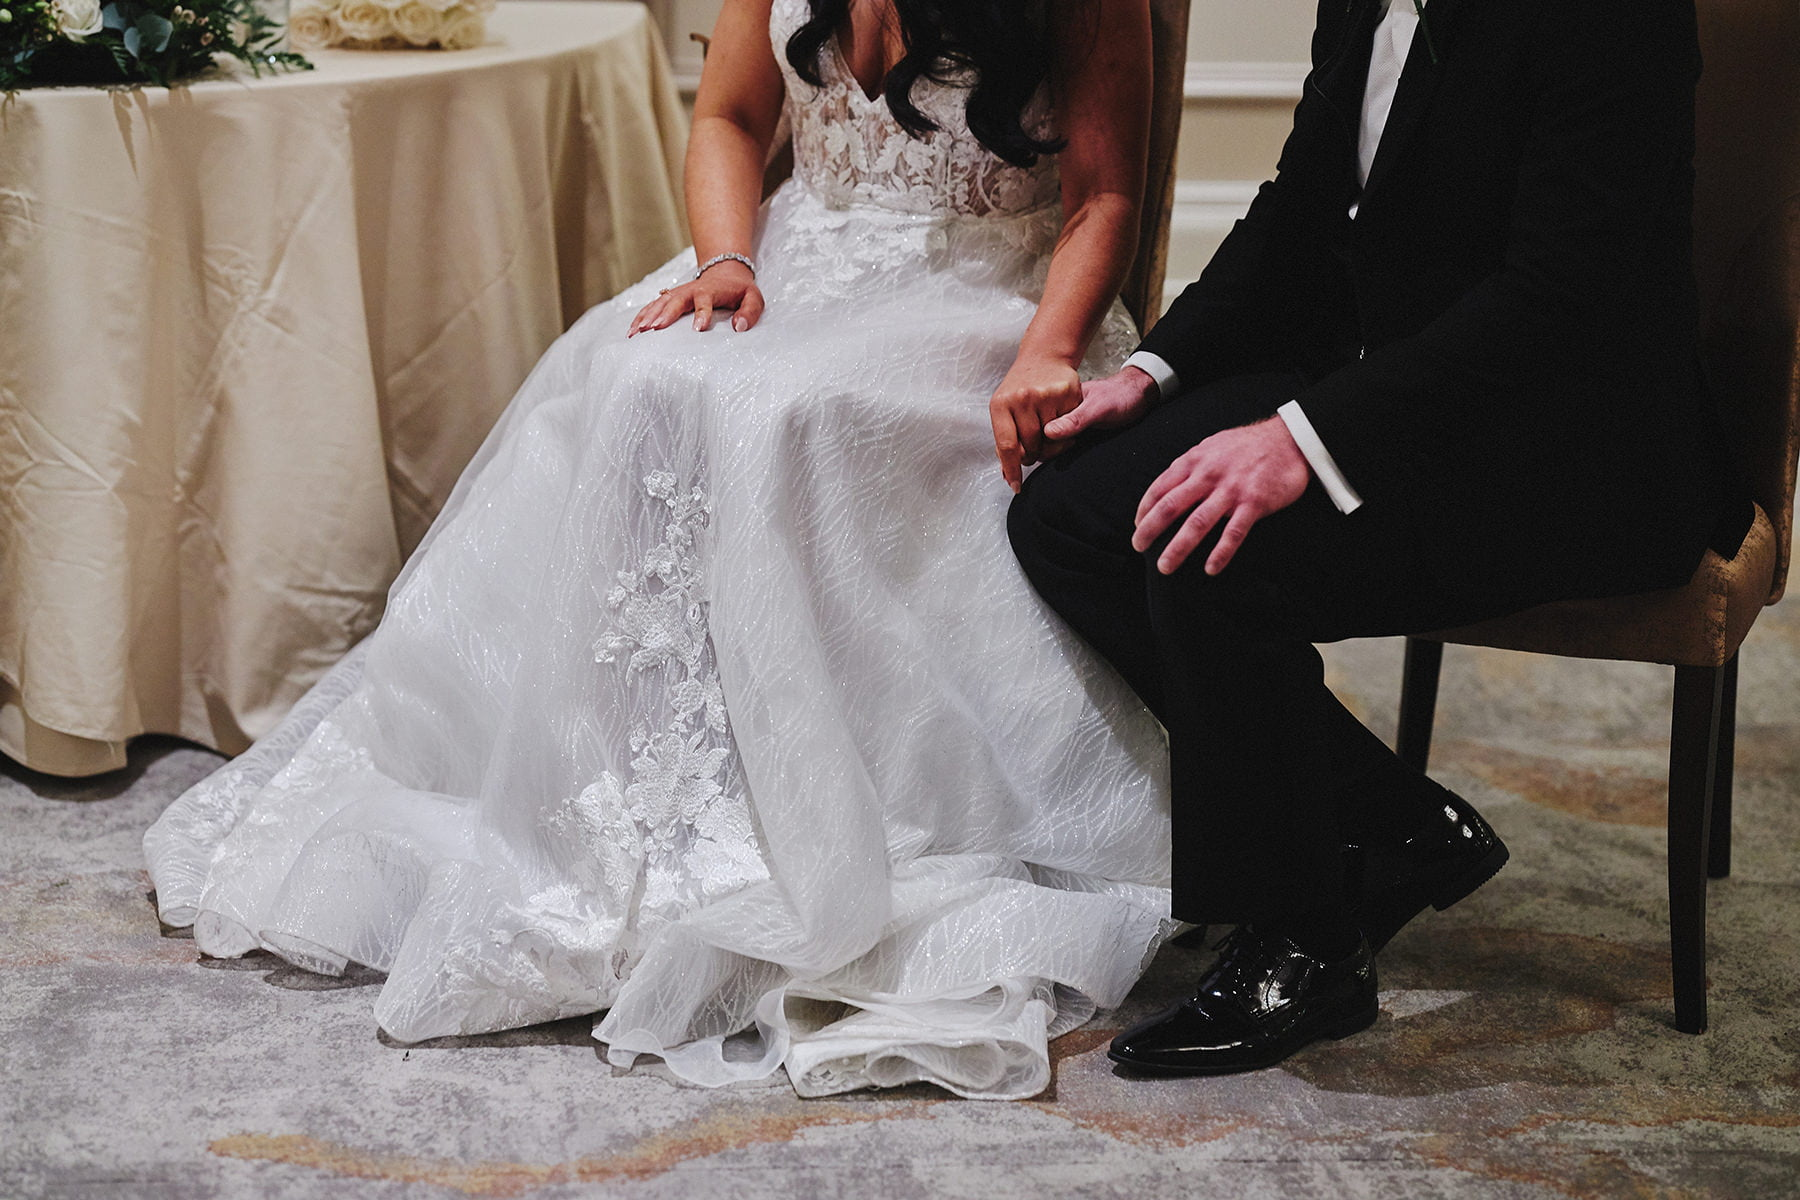 POWERSCOURT HOTEL RESORT INTIMATE WEDDING 48